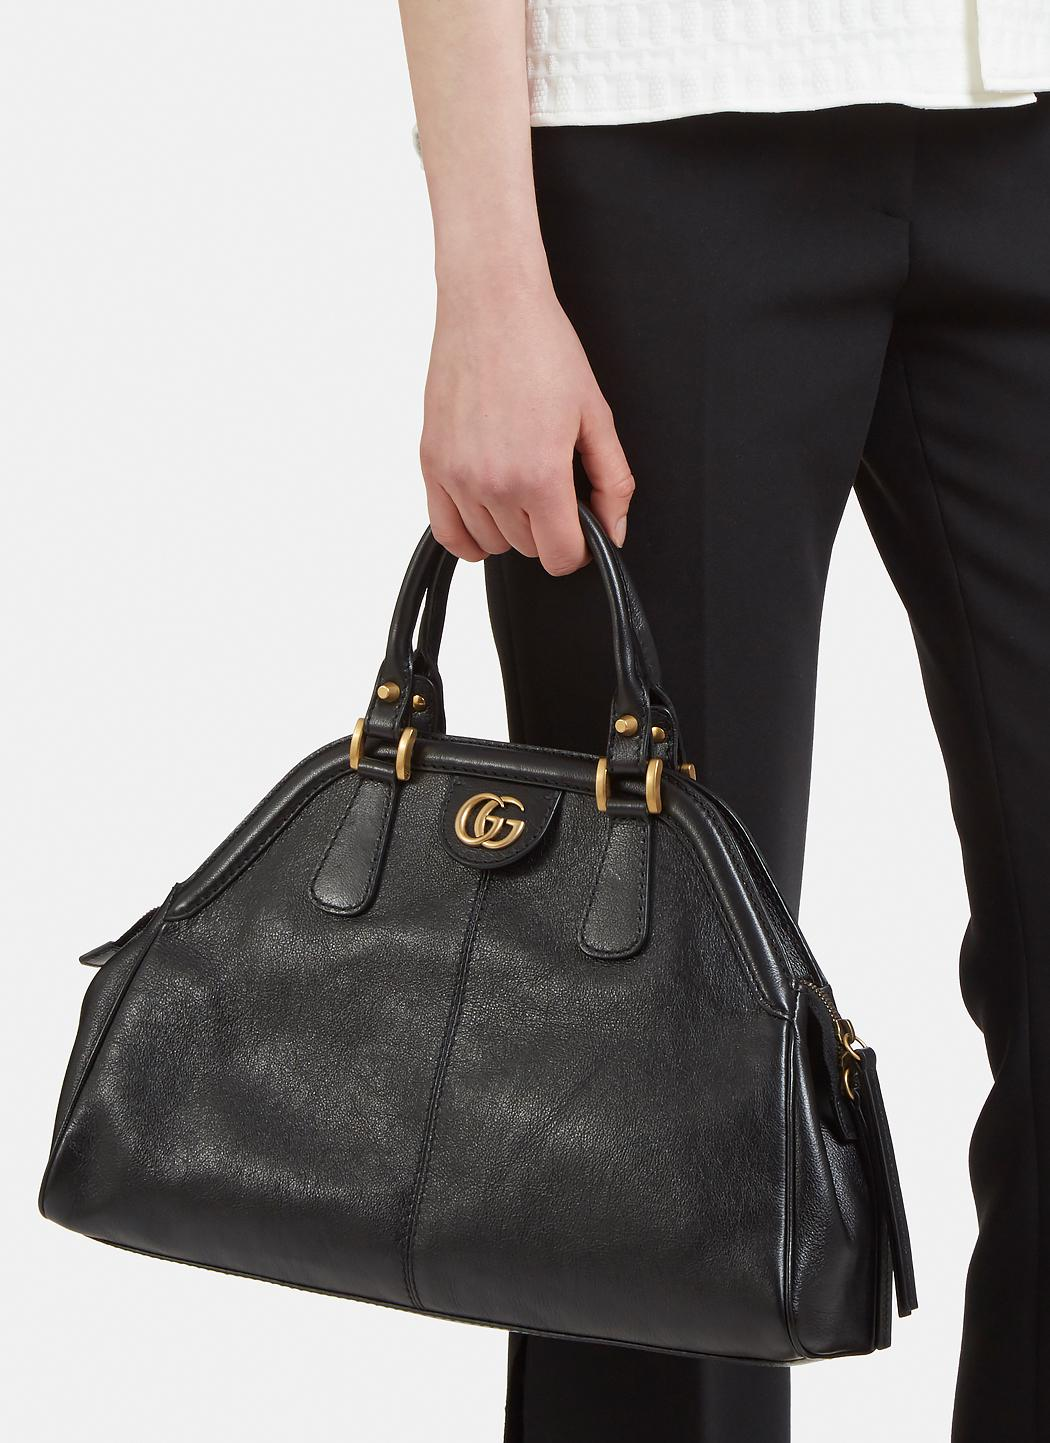 Lyst Gucci Rebelle Leather Handbag In Black Alma Mini Bag Gallery